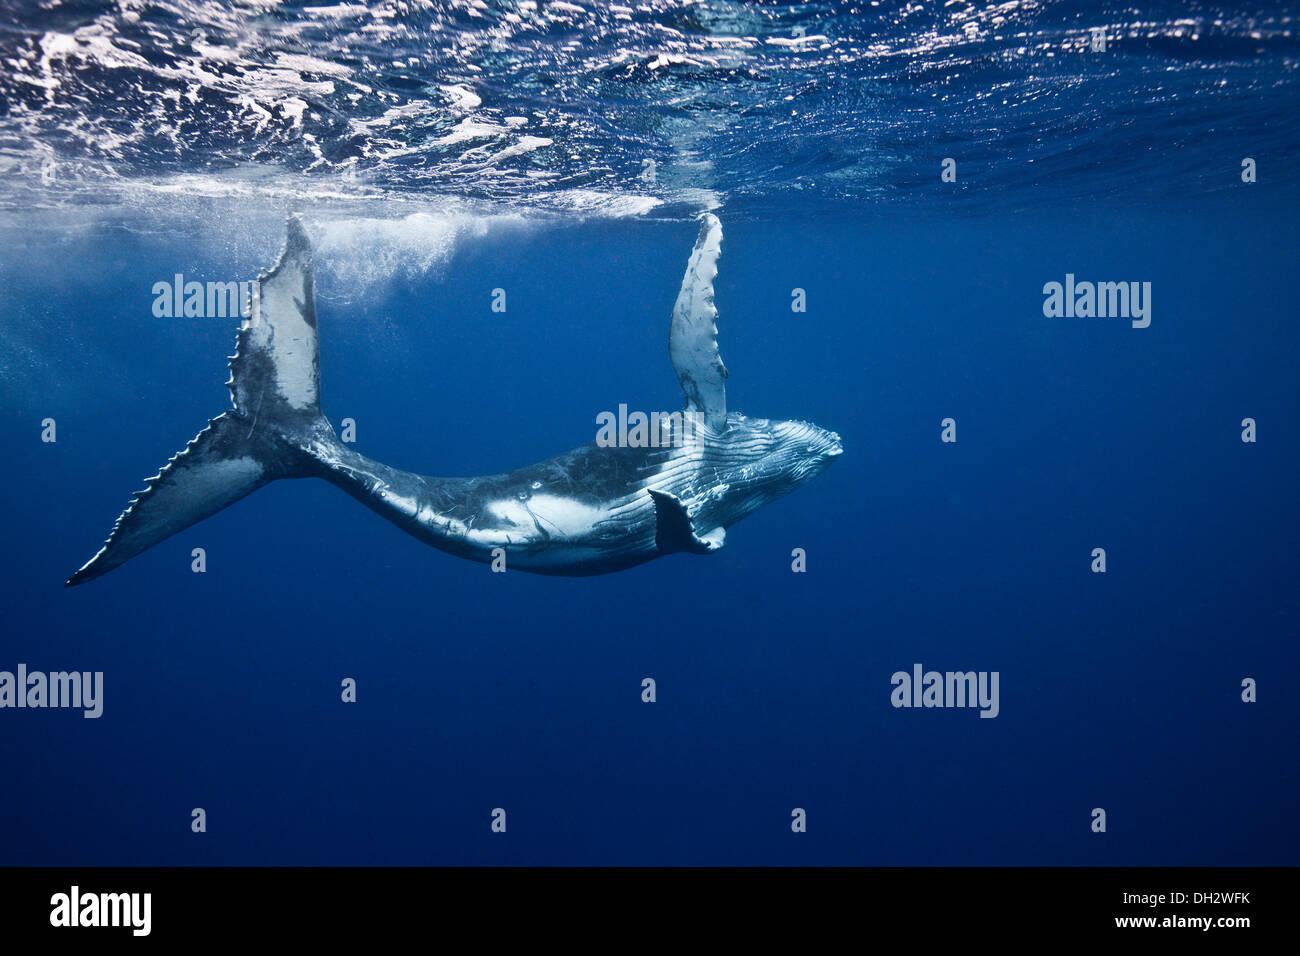 Humpback whales underwater - Stock Image